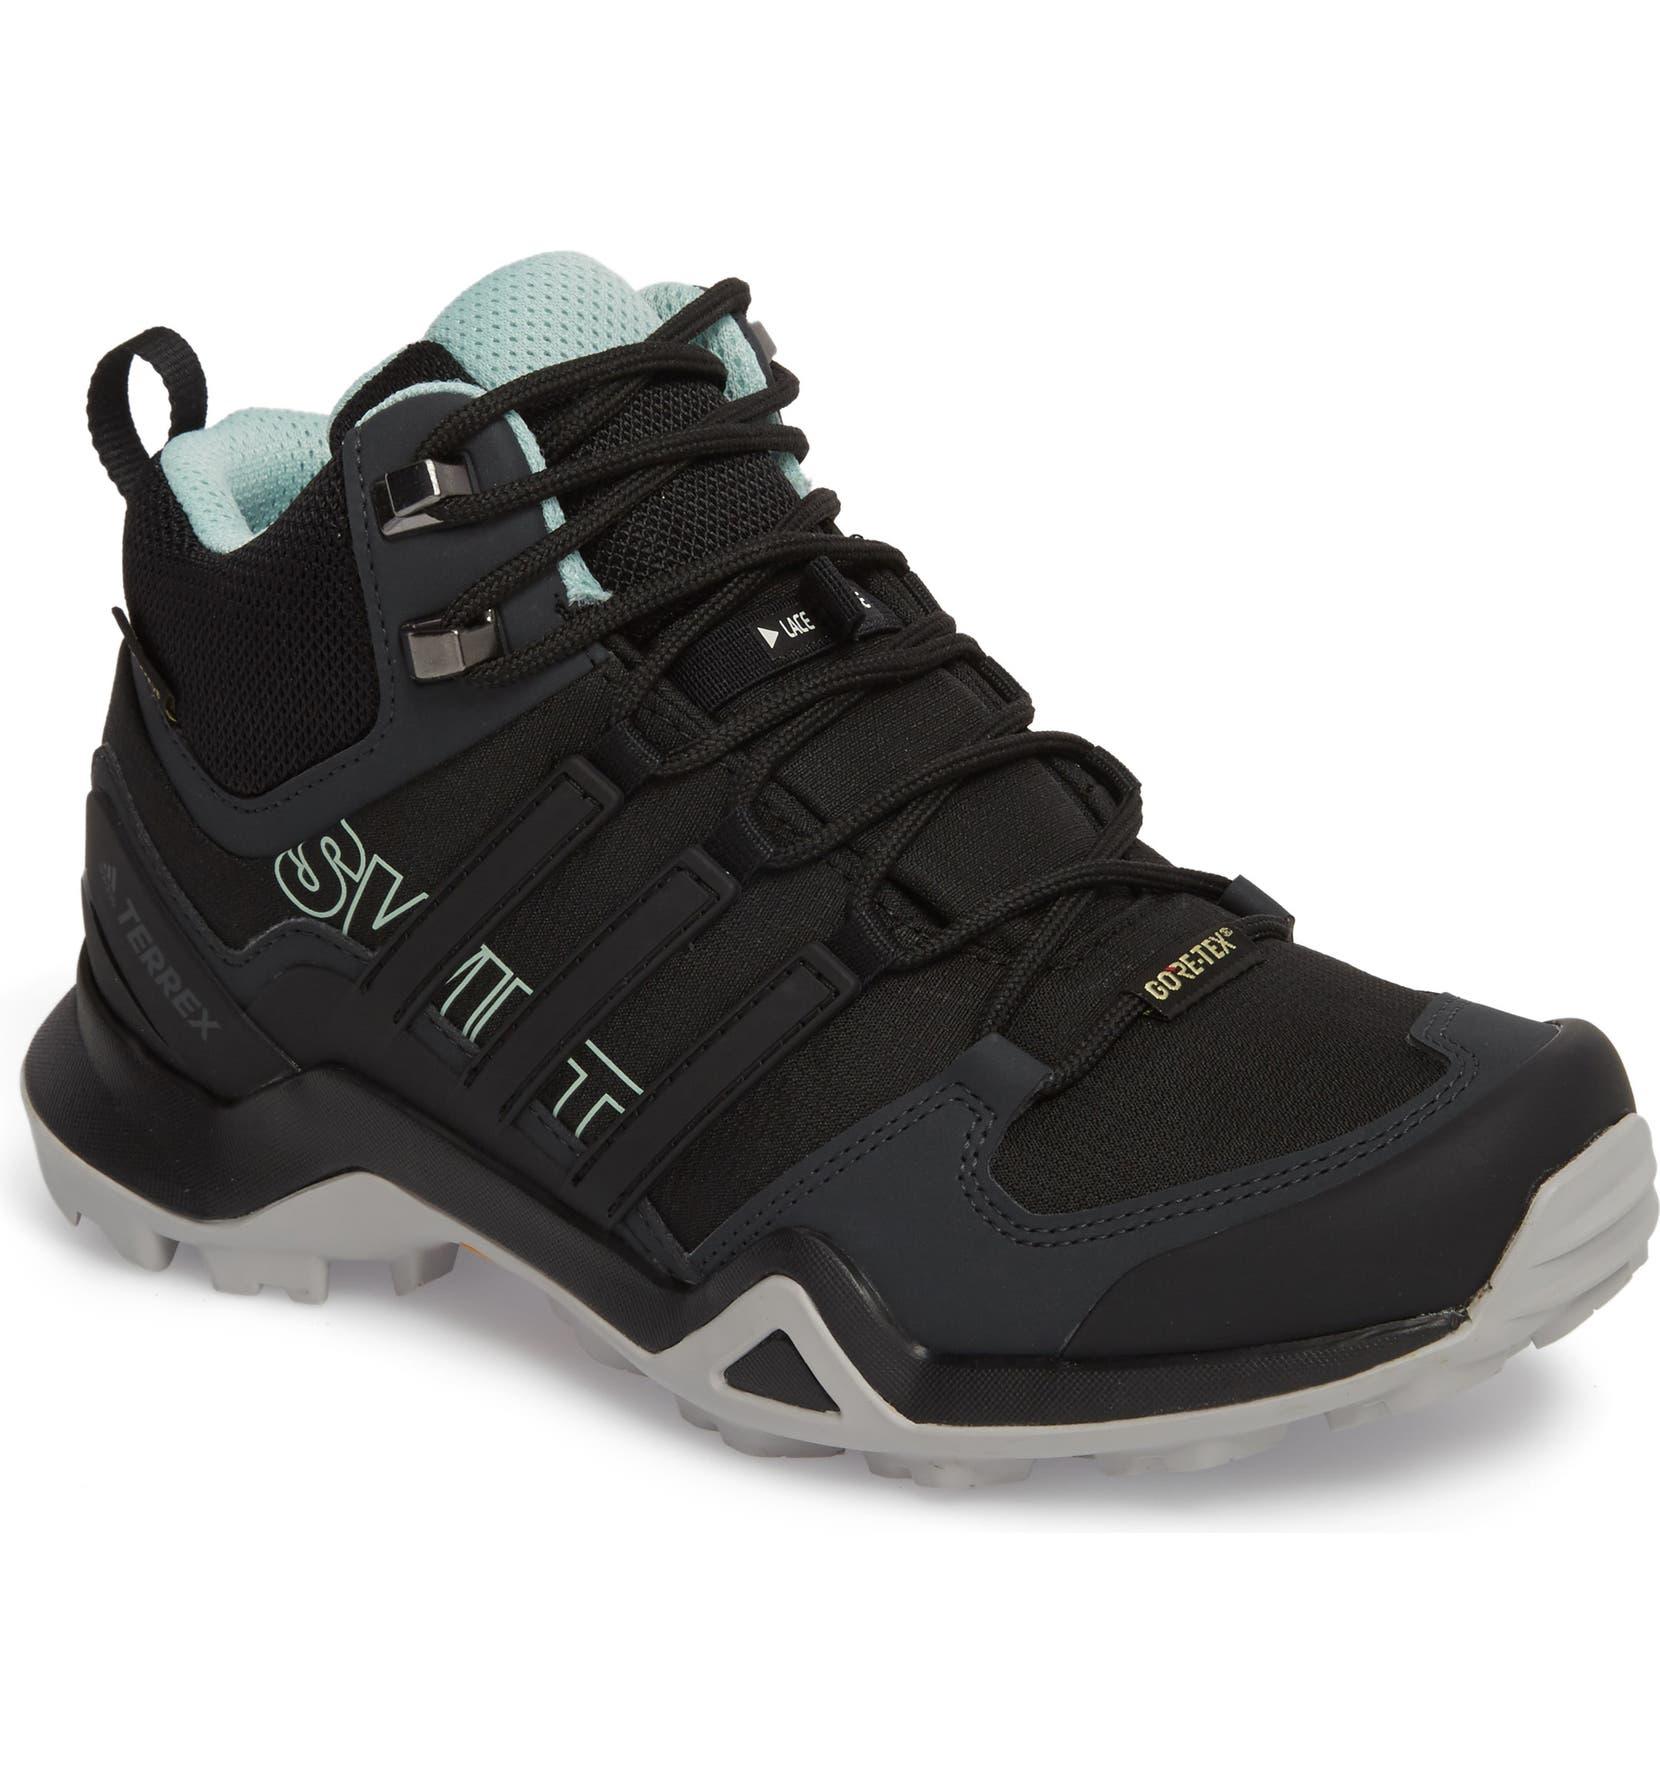 d6177c1f07e adidas Terrex Swift R2 Mid Gore-Tex® Hiking Boot (Women)